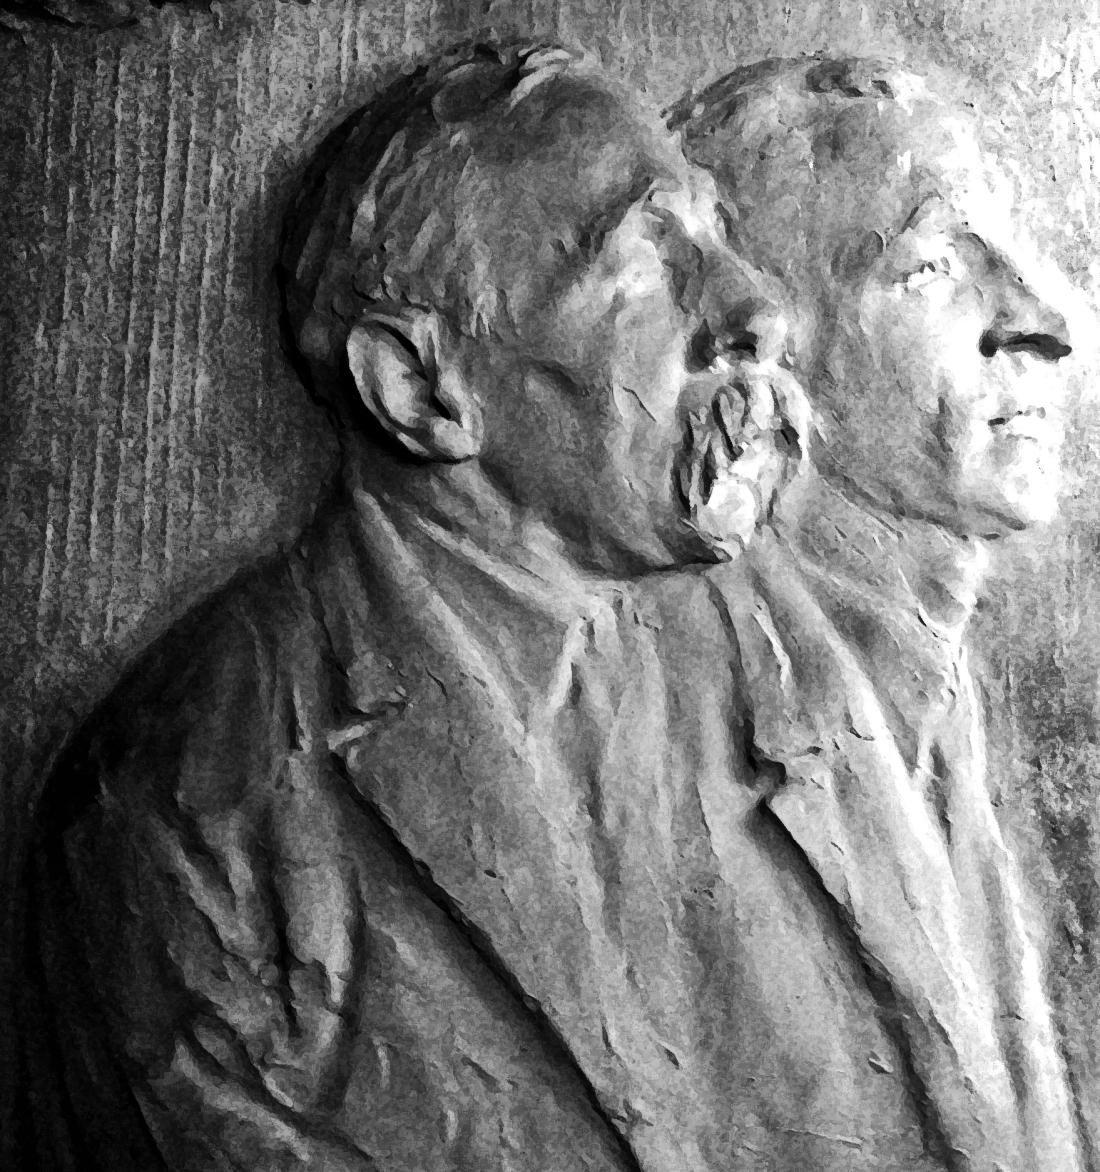 Bas Relief, Sacco and Vanzetti by Gutzon Borglum